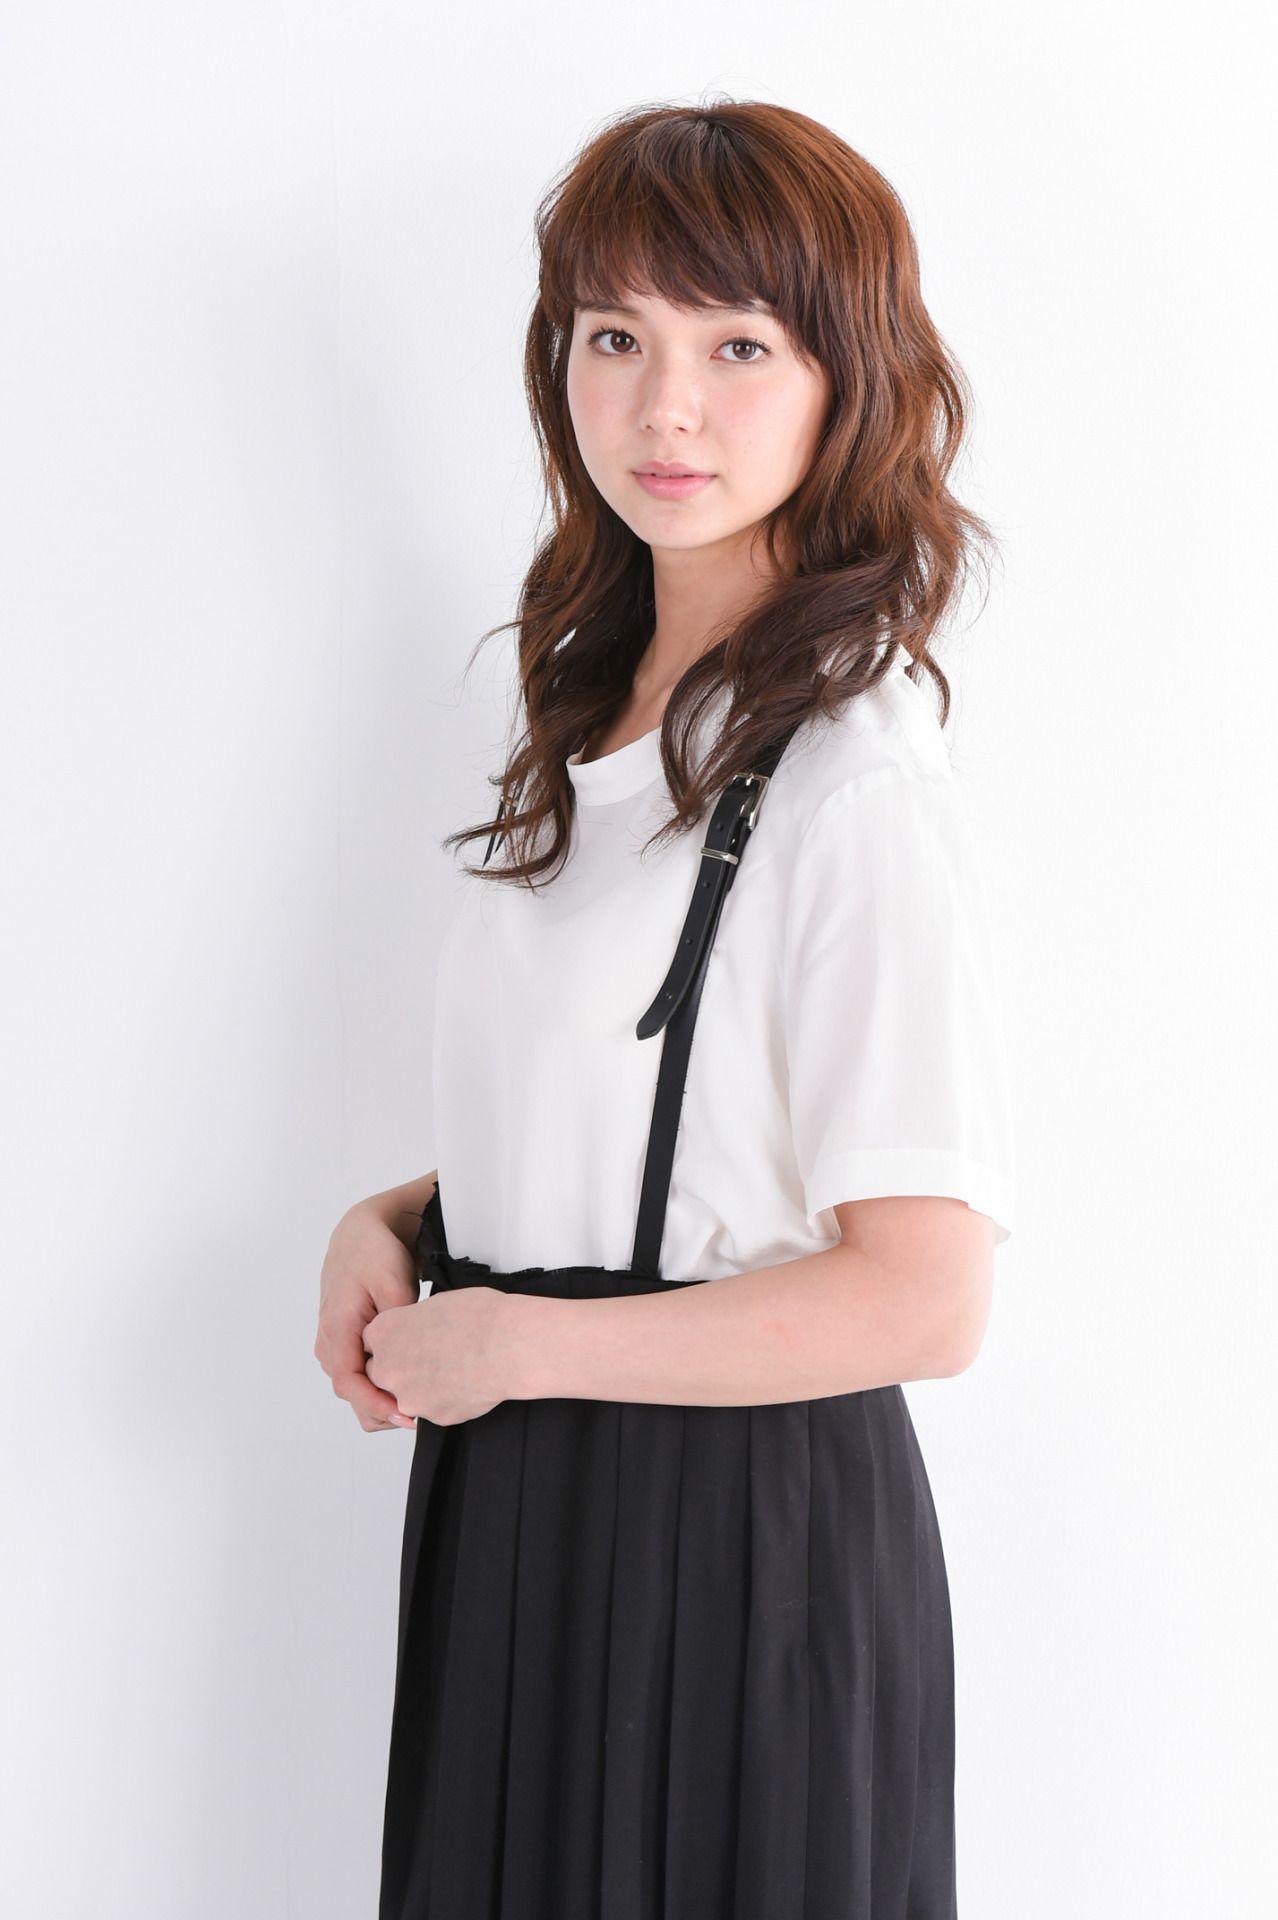 多部未華子mikako Tabe Mikako Tabe Pinterest Actresses